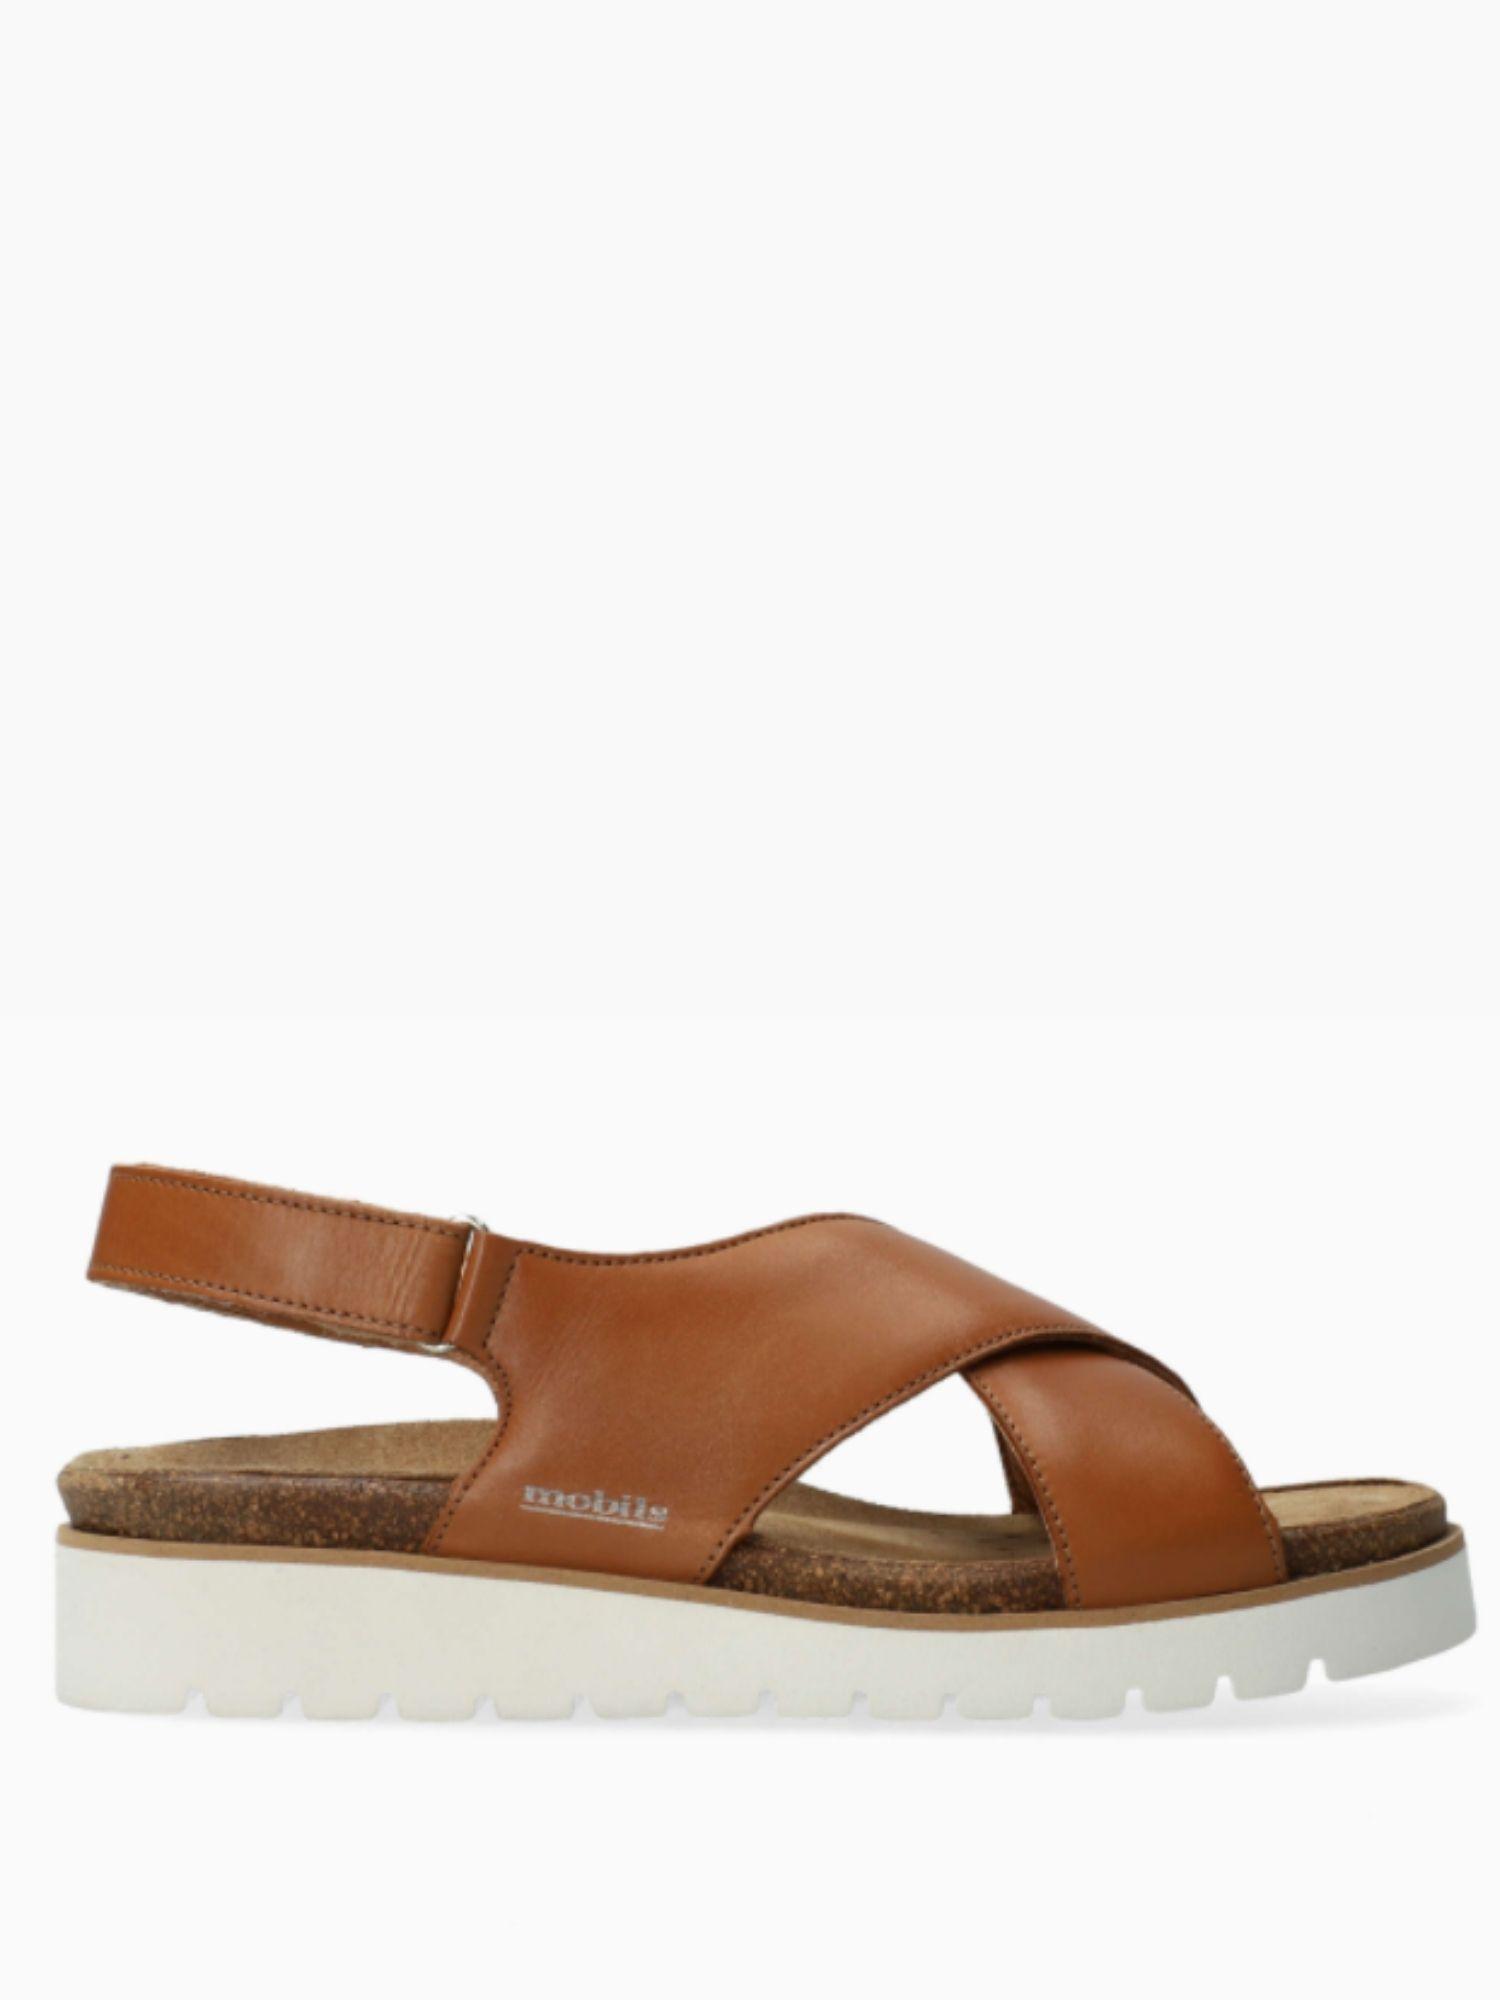 Sandalo Mephisto Tally Cuoio laterale